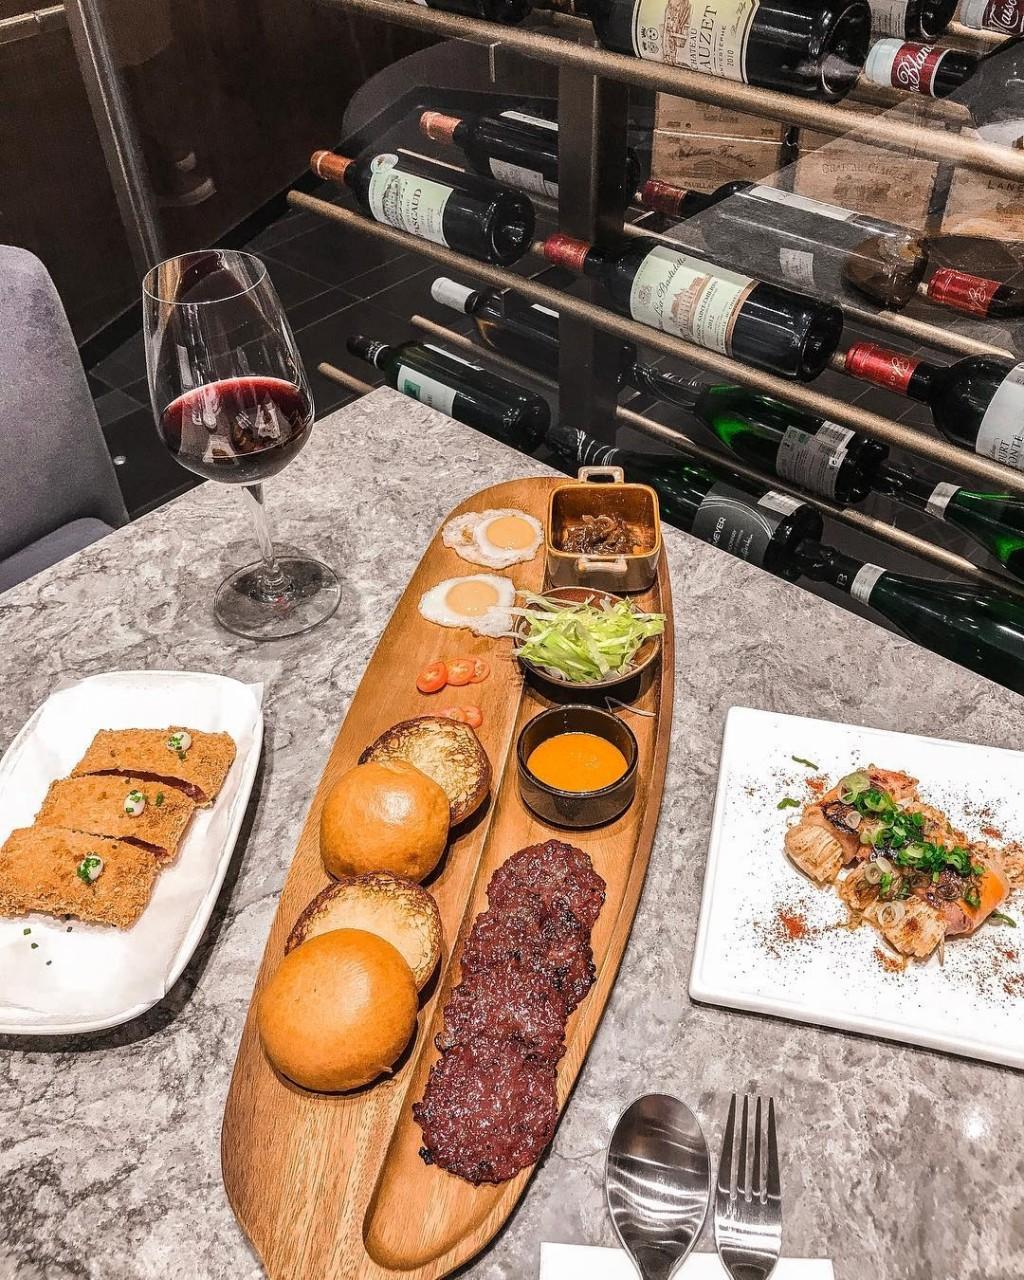 Celebrity chef restaurants boston 2019 rugby